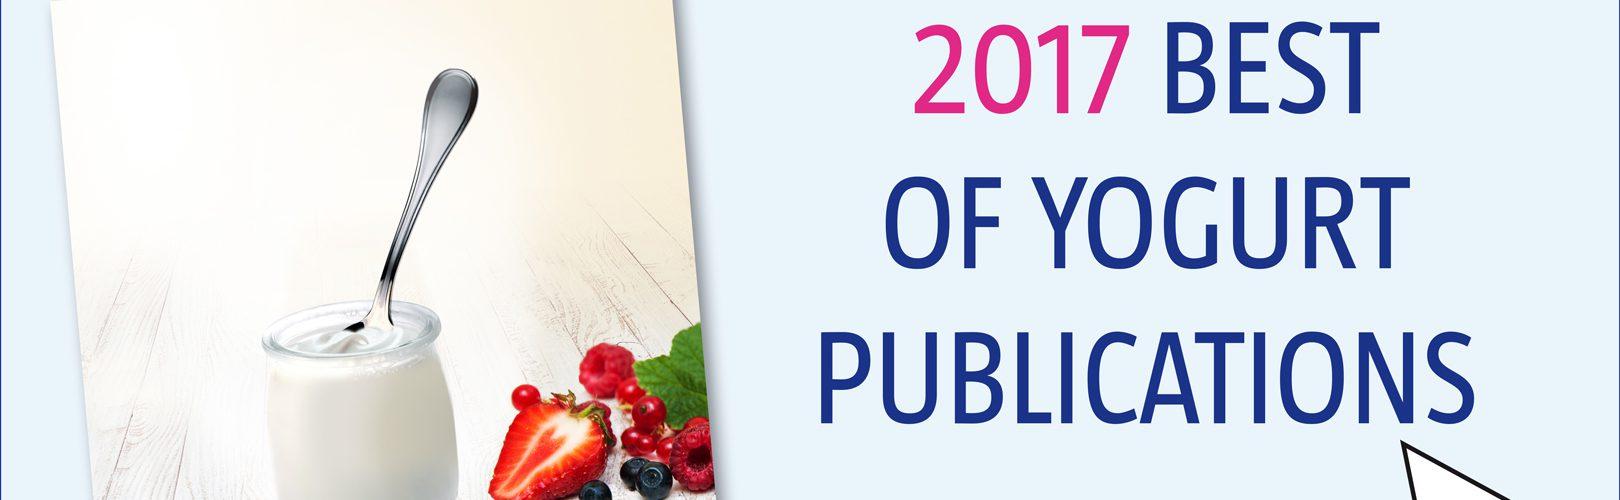 best-of-yogurt-publications